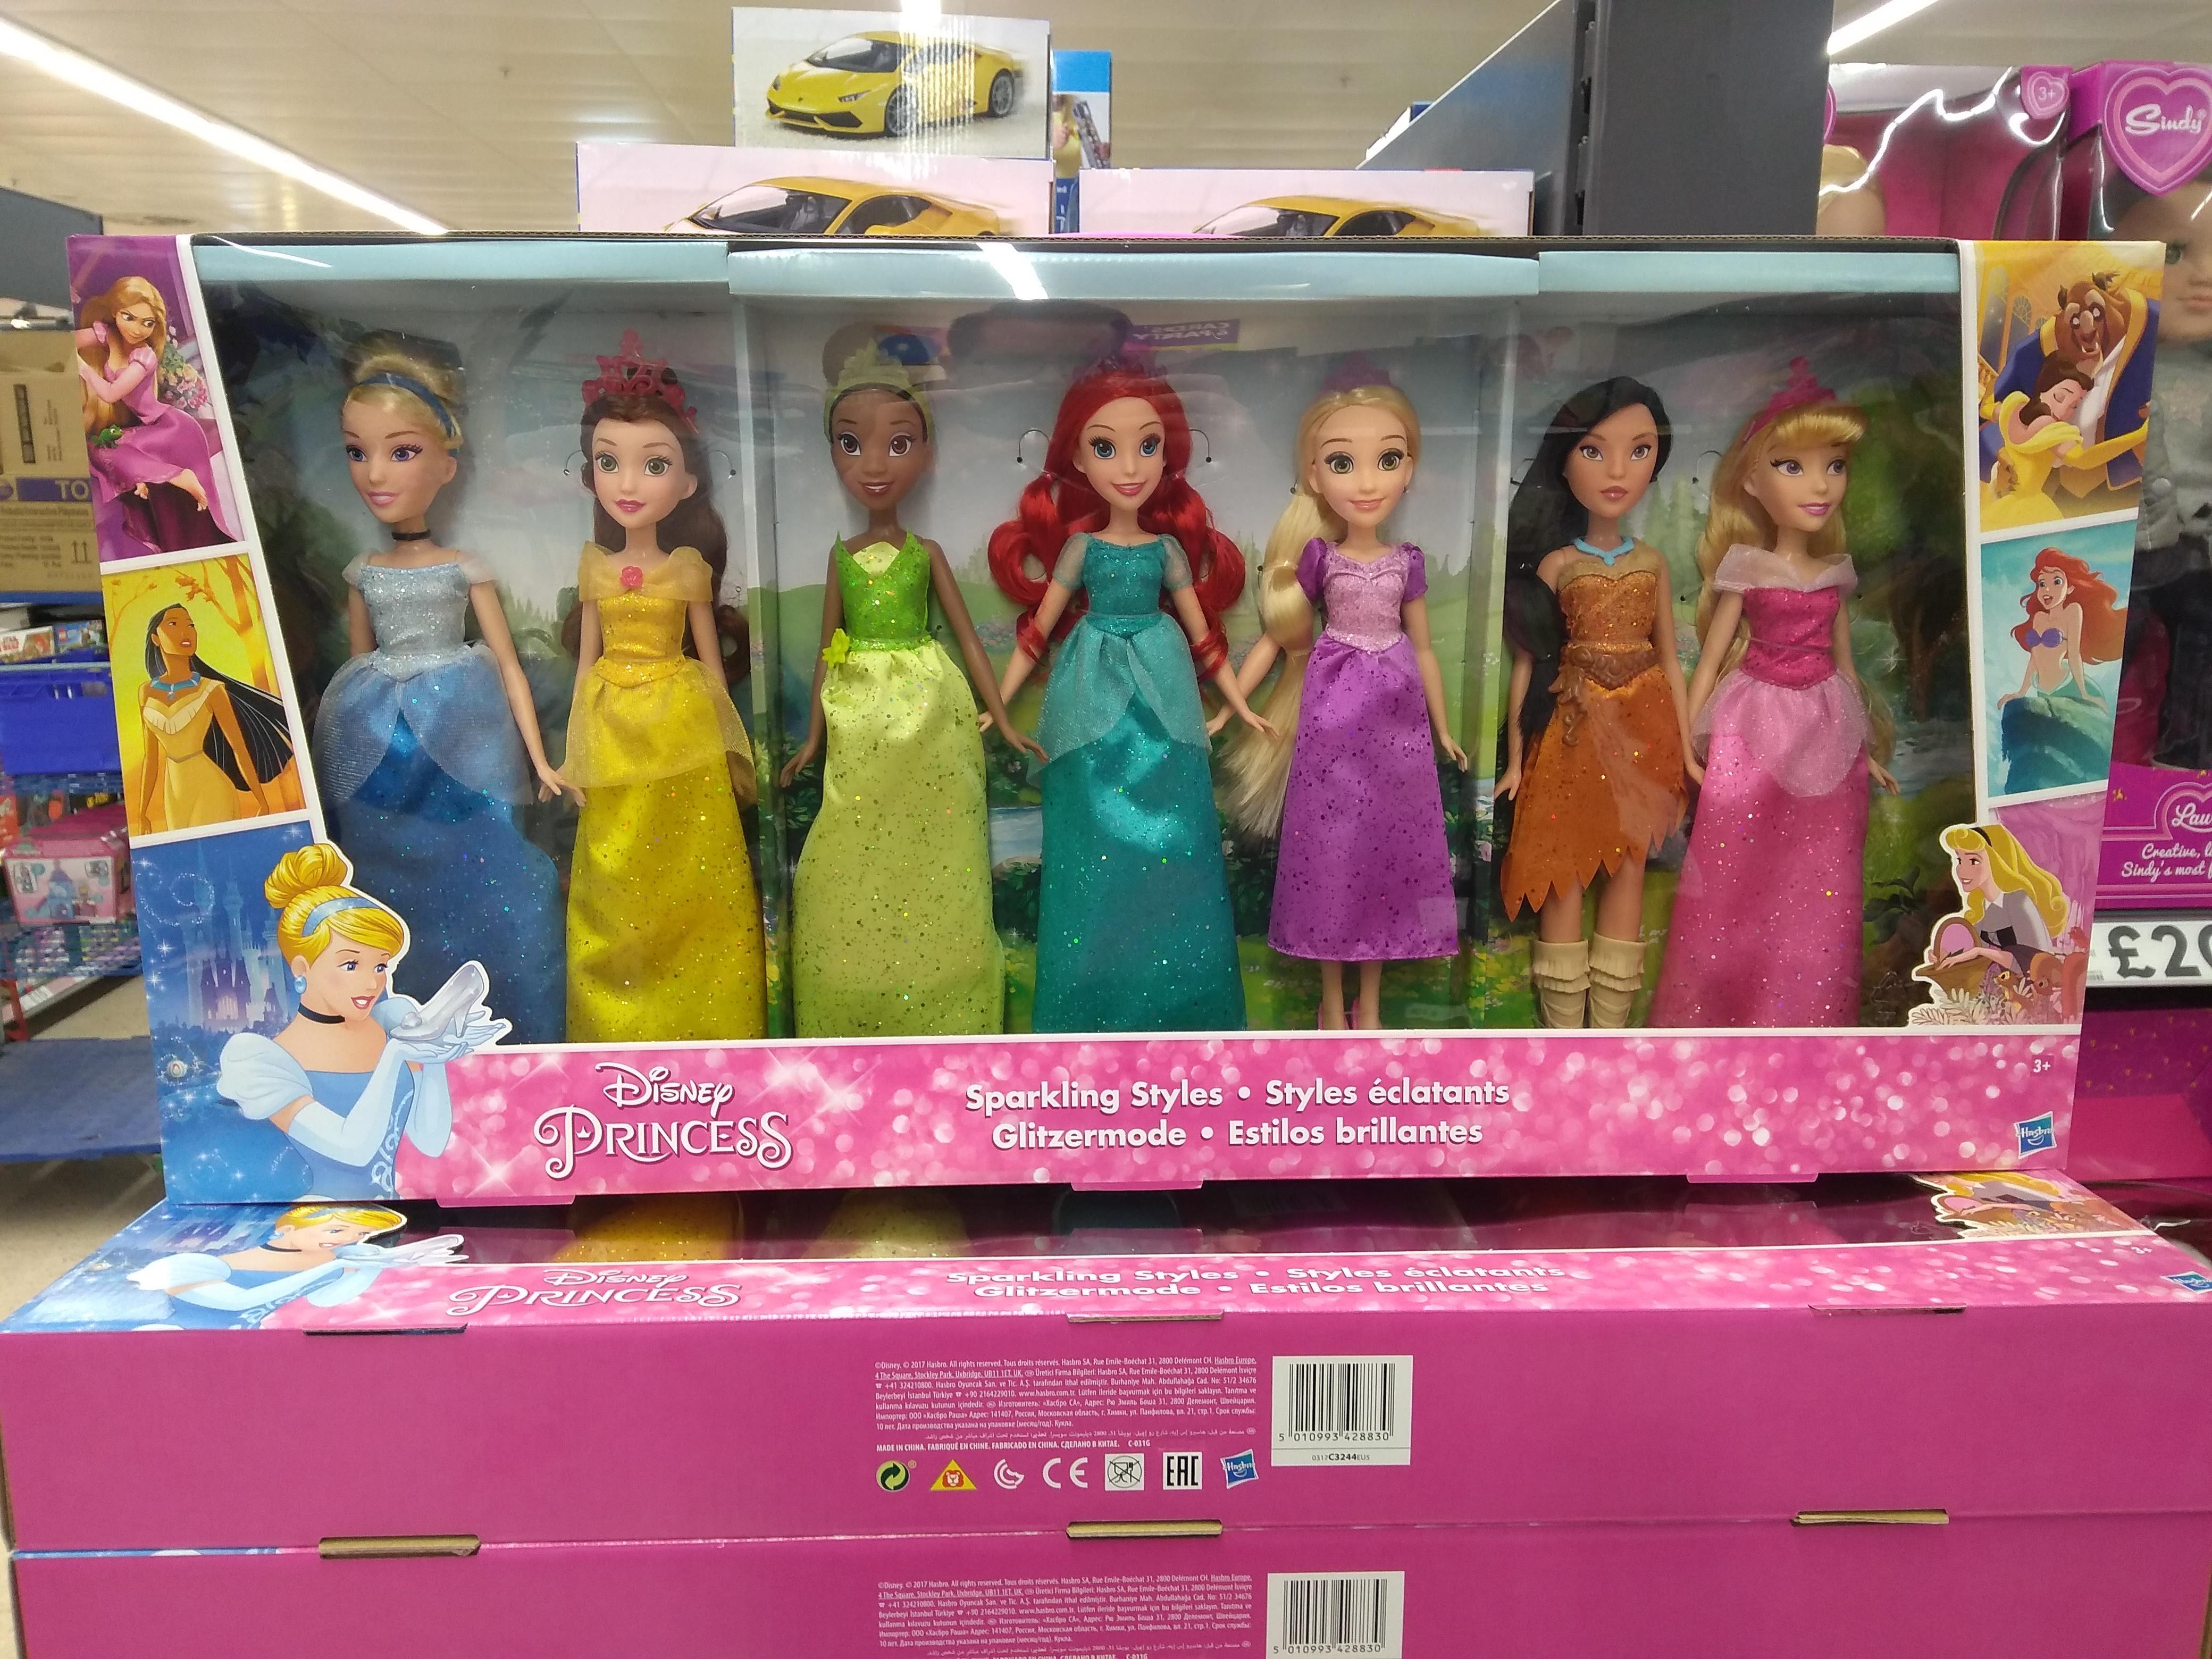 Disney Princess 'Sparkling Styles' Set of 7 Dolls - £40 (Was £80) Instore @ Tesco Extra